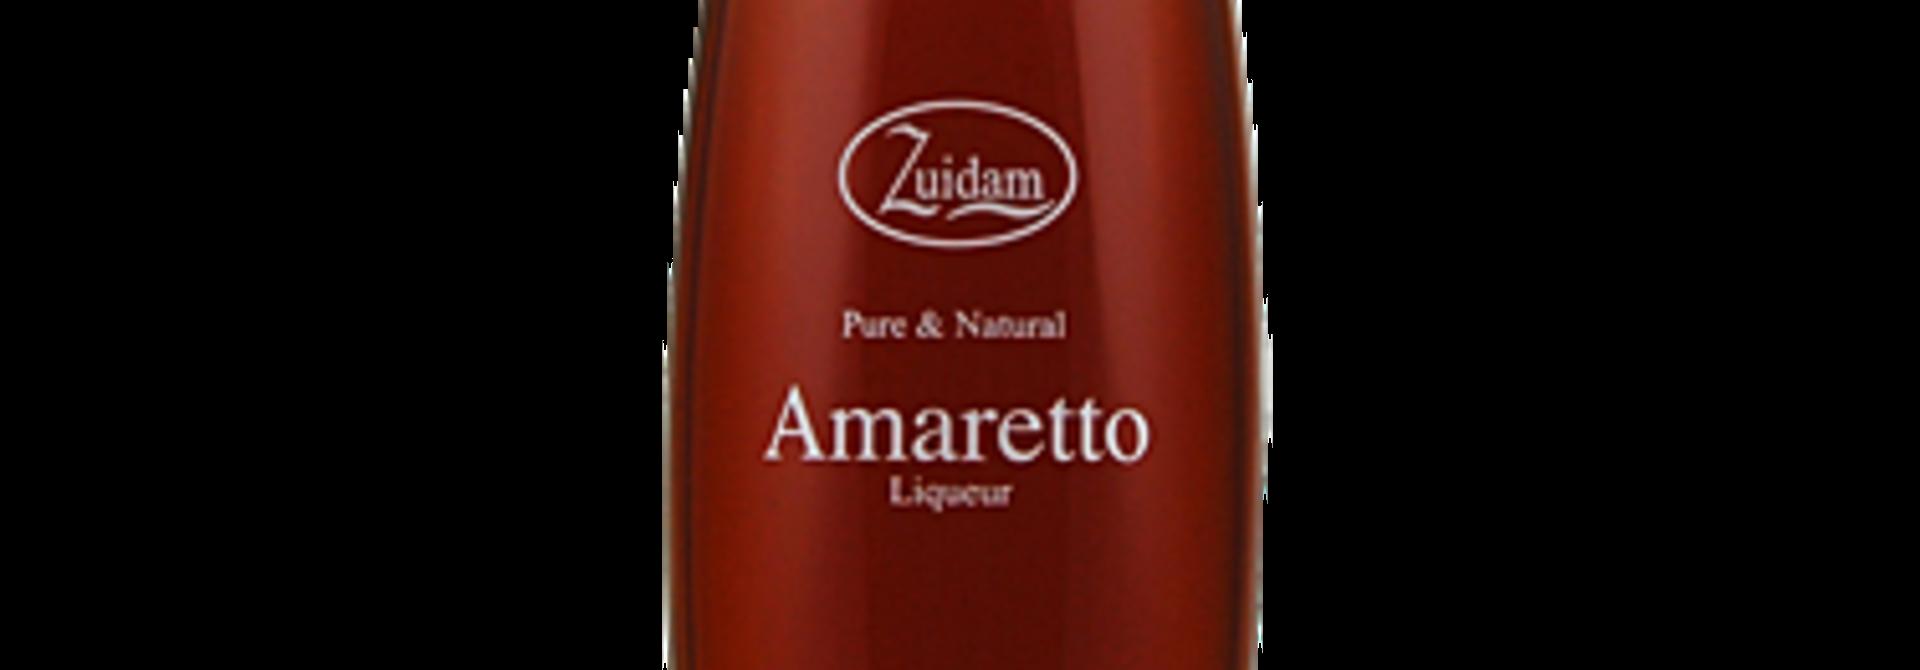 ZUIDAM Amaretto Liqueur 0.7ltr